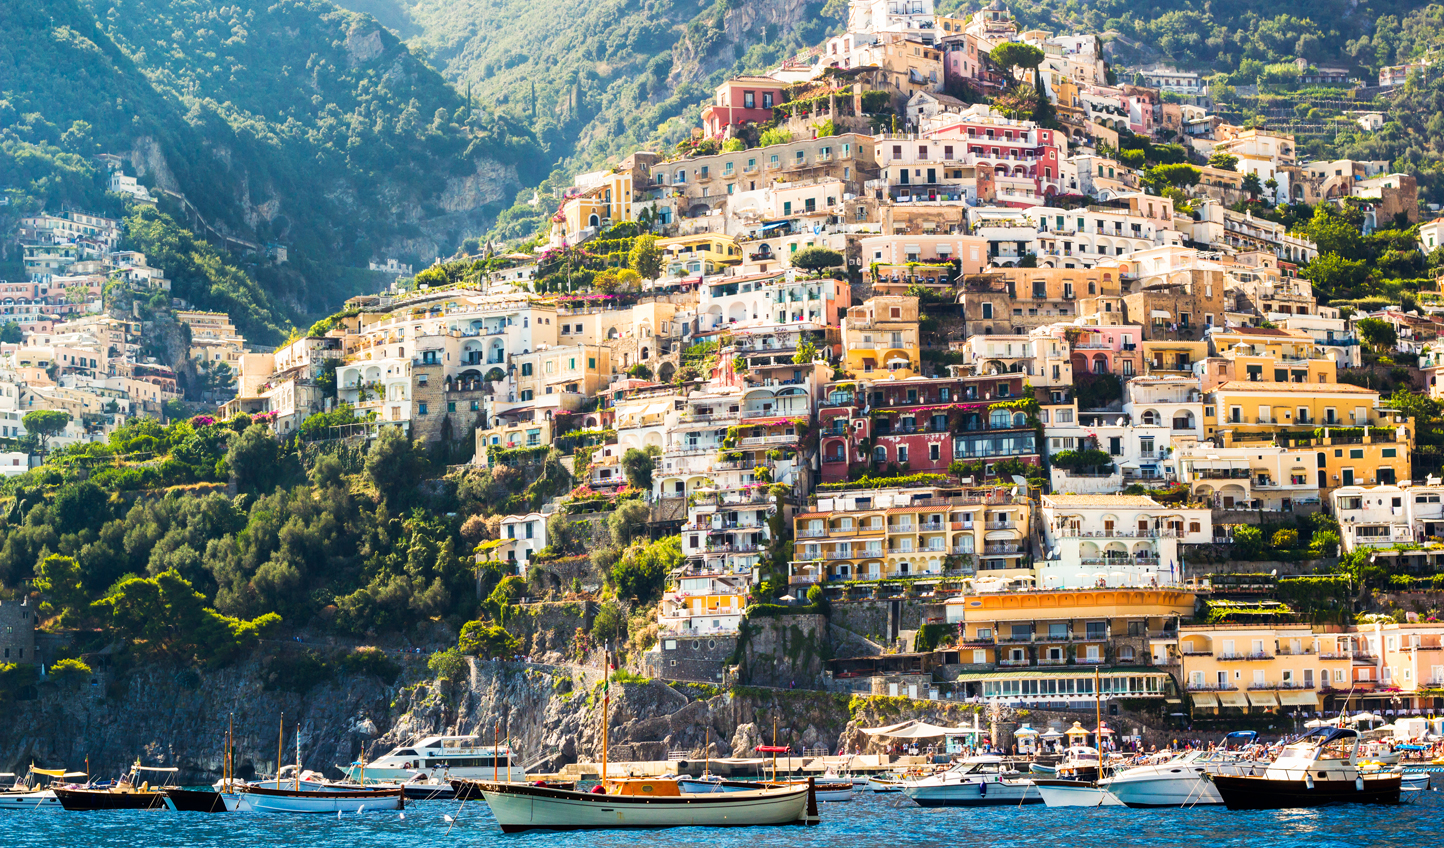 Sail up the glittering Amalfi Coast